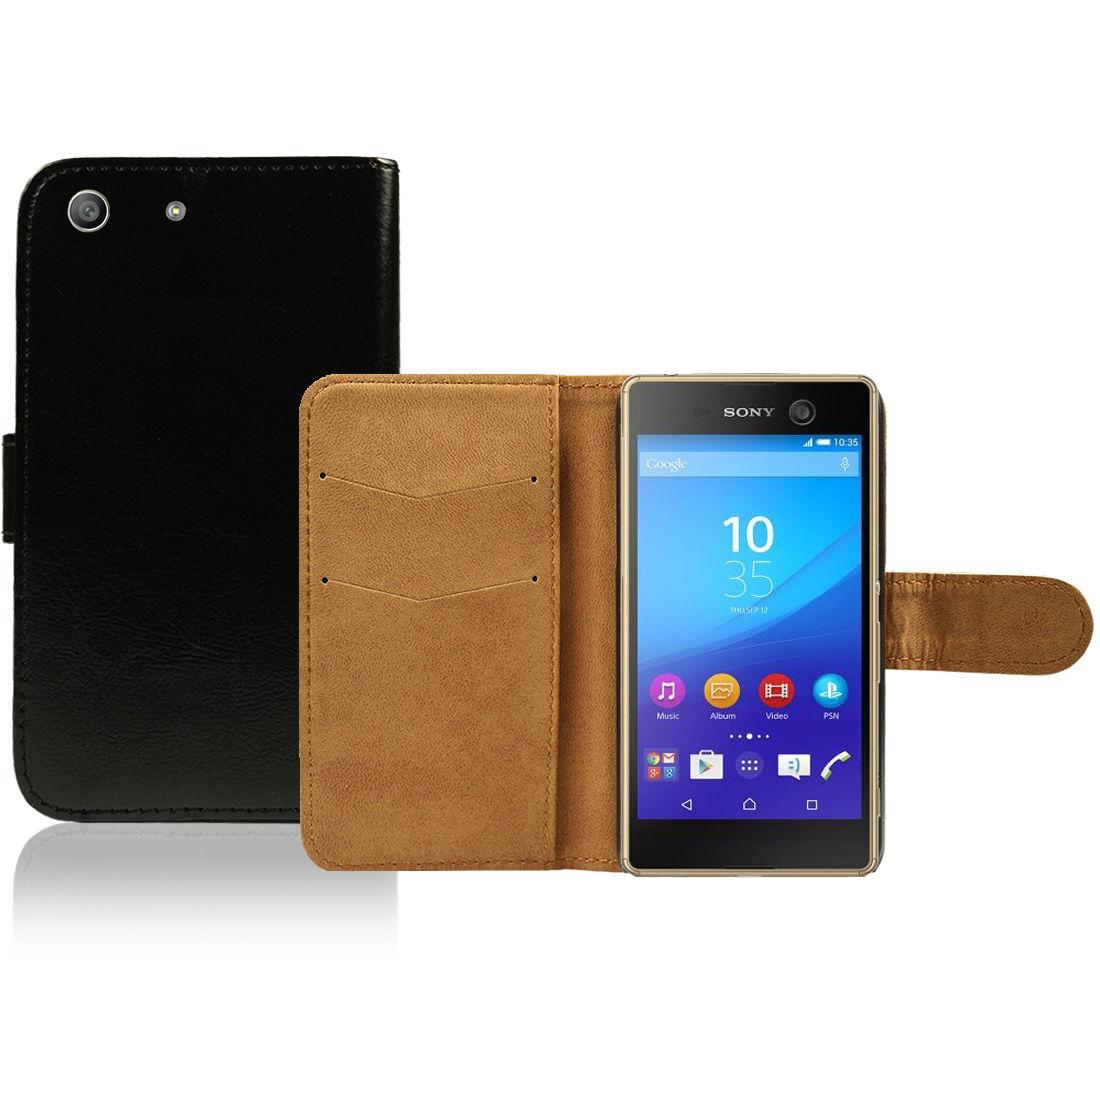 Pouzdro pro Sony Xperia M5 černé